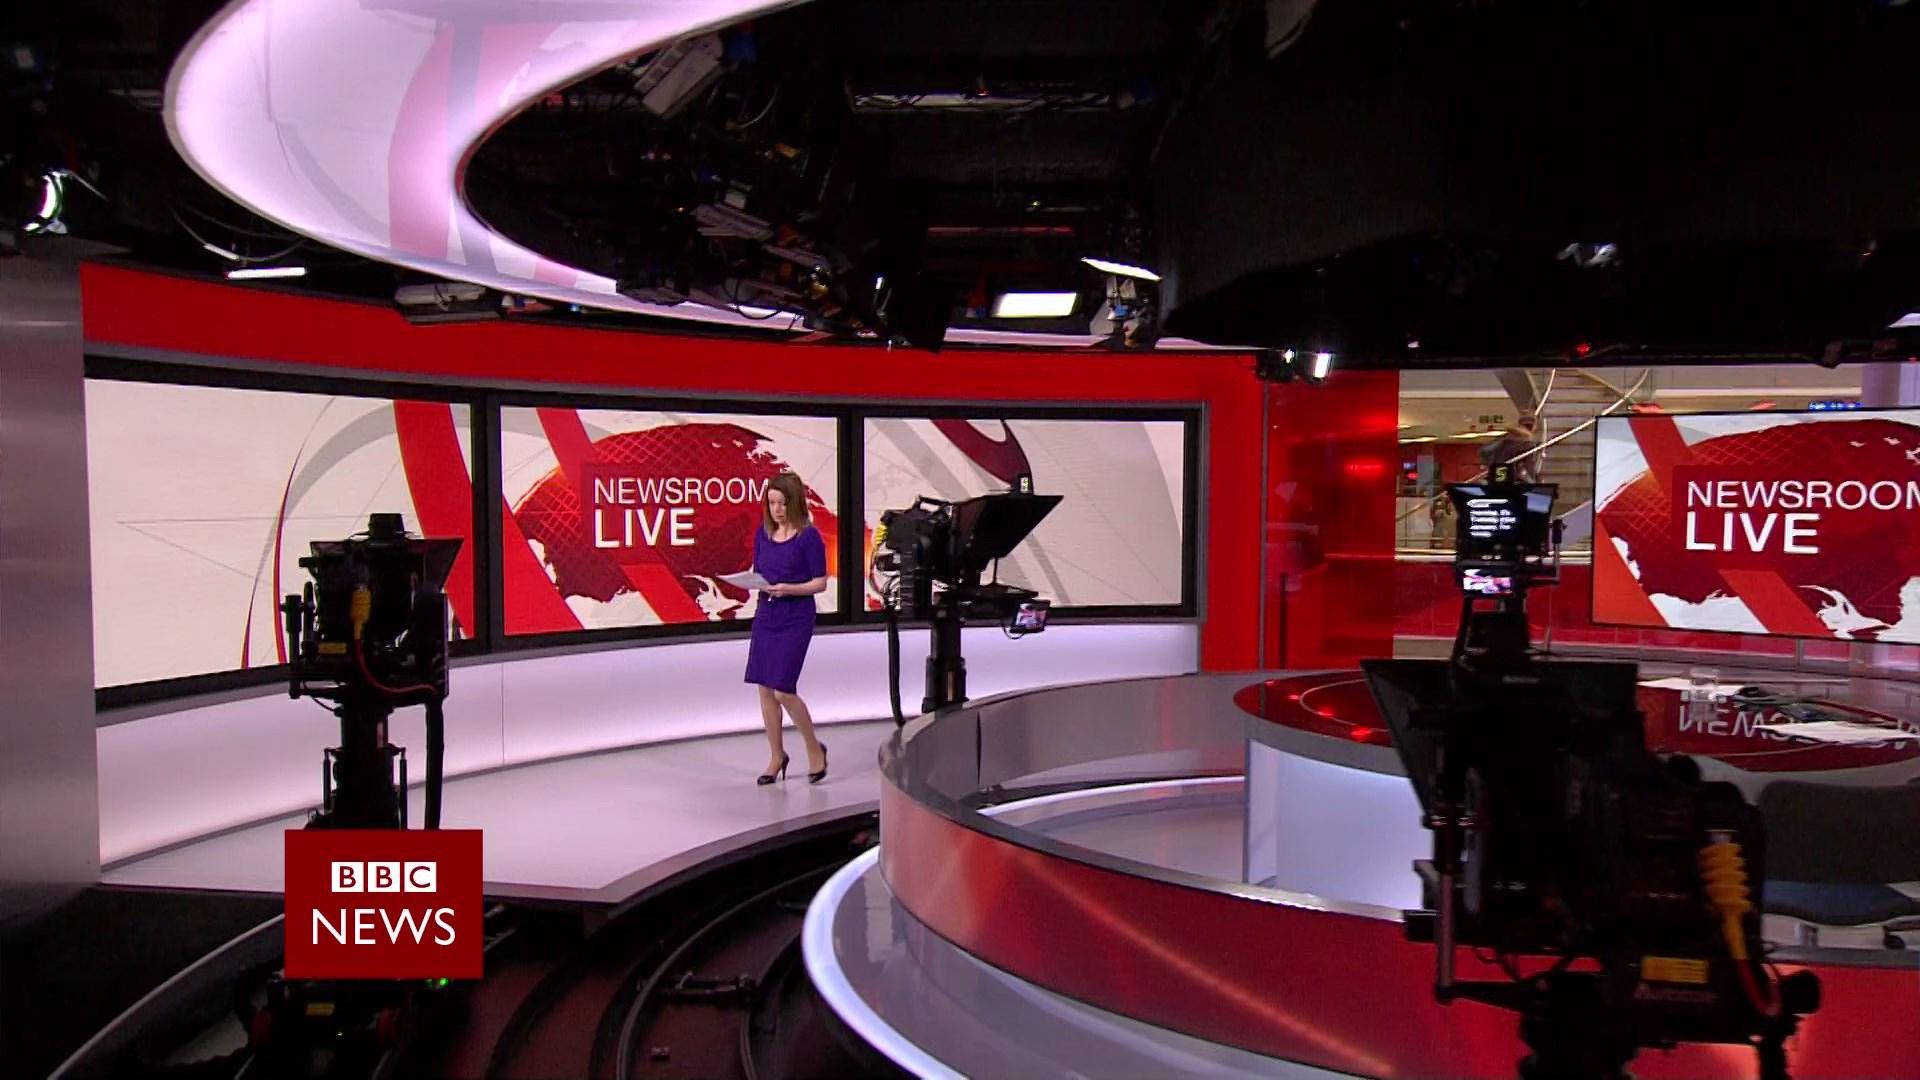 62384226_bbc-newsroom-live_20180123_11001200-ts_snapshot_00-02-08_-2018-01-23_16-30-45.jpg